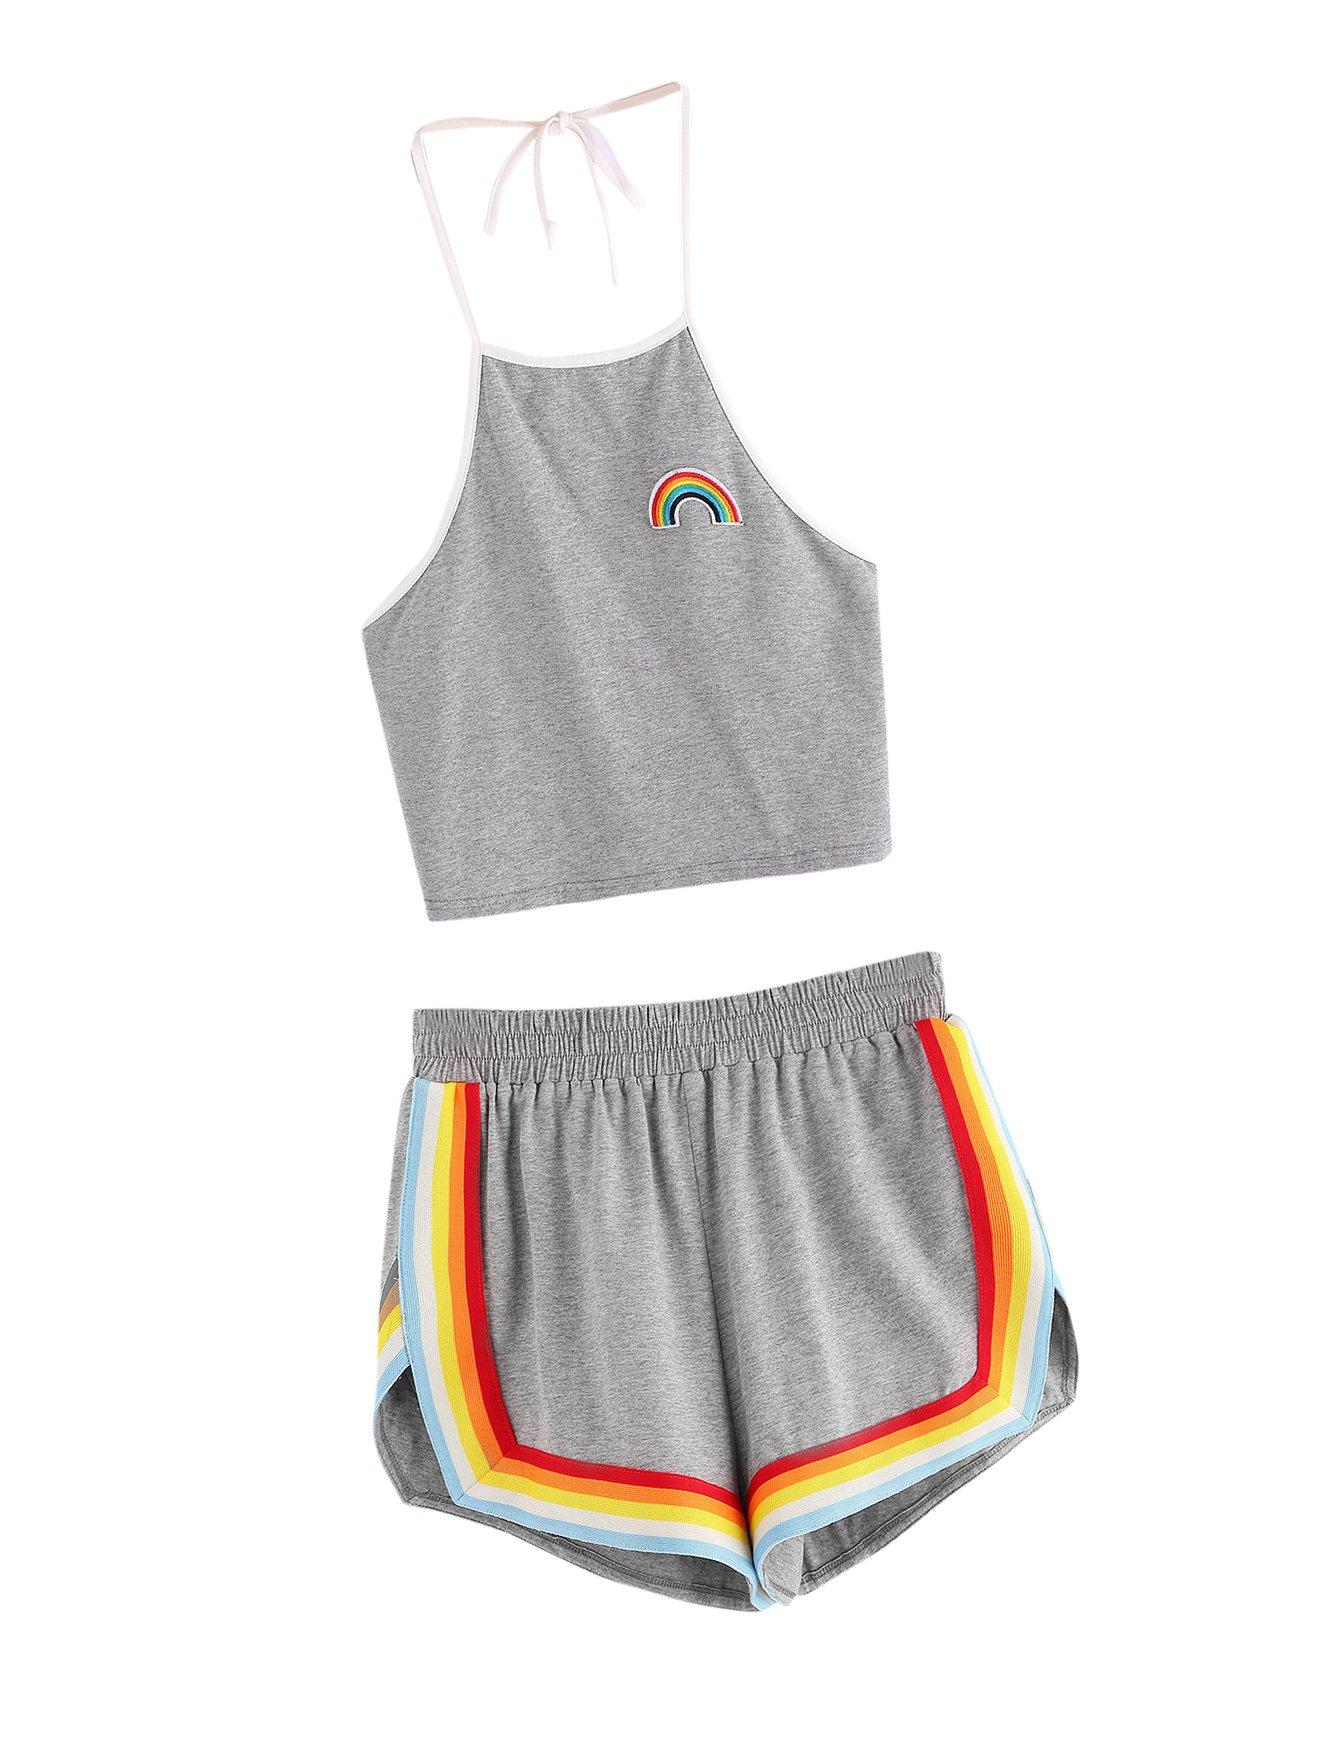 SweatyRocks Women's 2 Piece Set Halter Crop Top and Shorts Set Grey S